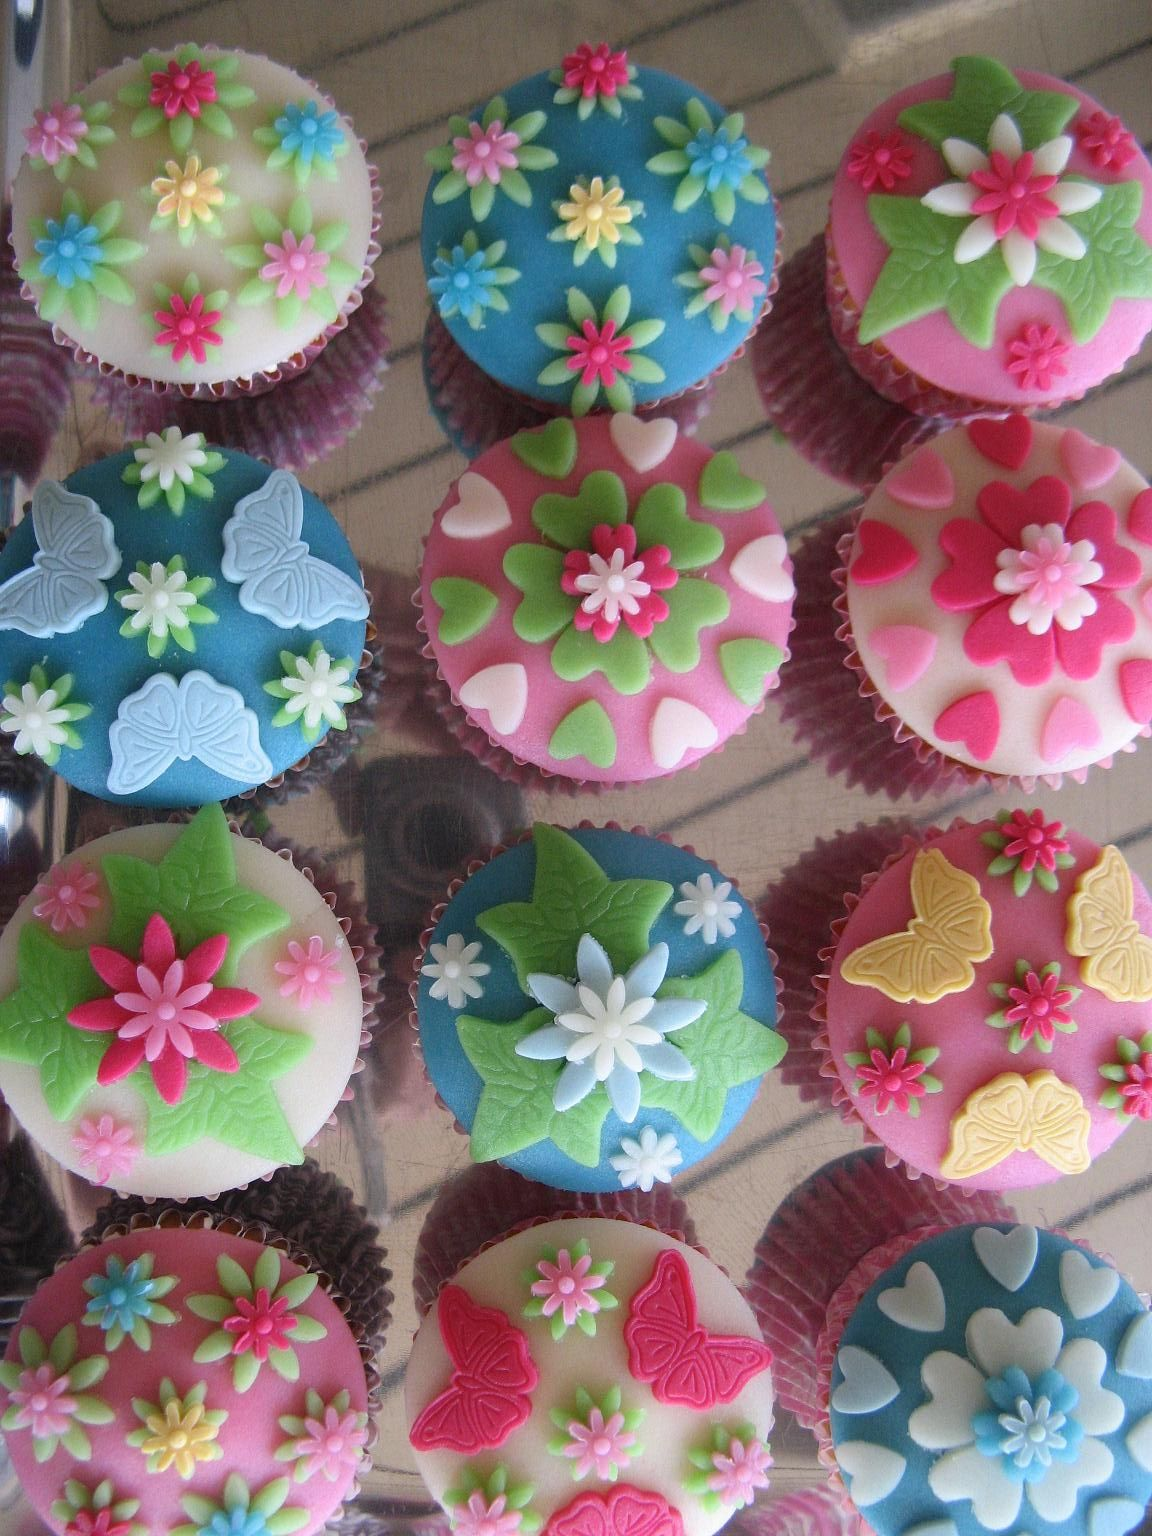 cupcakes met marsepein versiering cupcakes van tante cornelia pinterest cake cup cakes. Black Bedroom Furniture Sets. Home Design Ideas